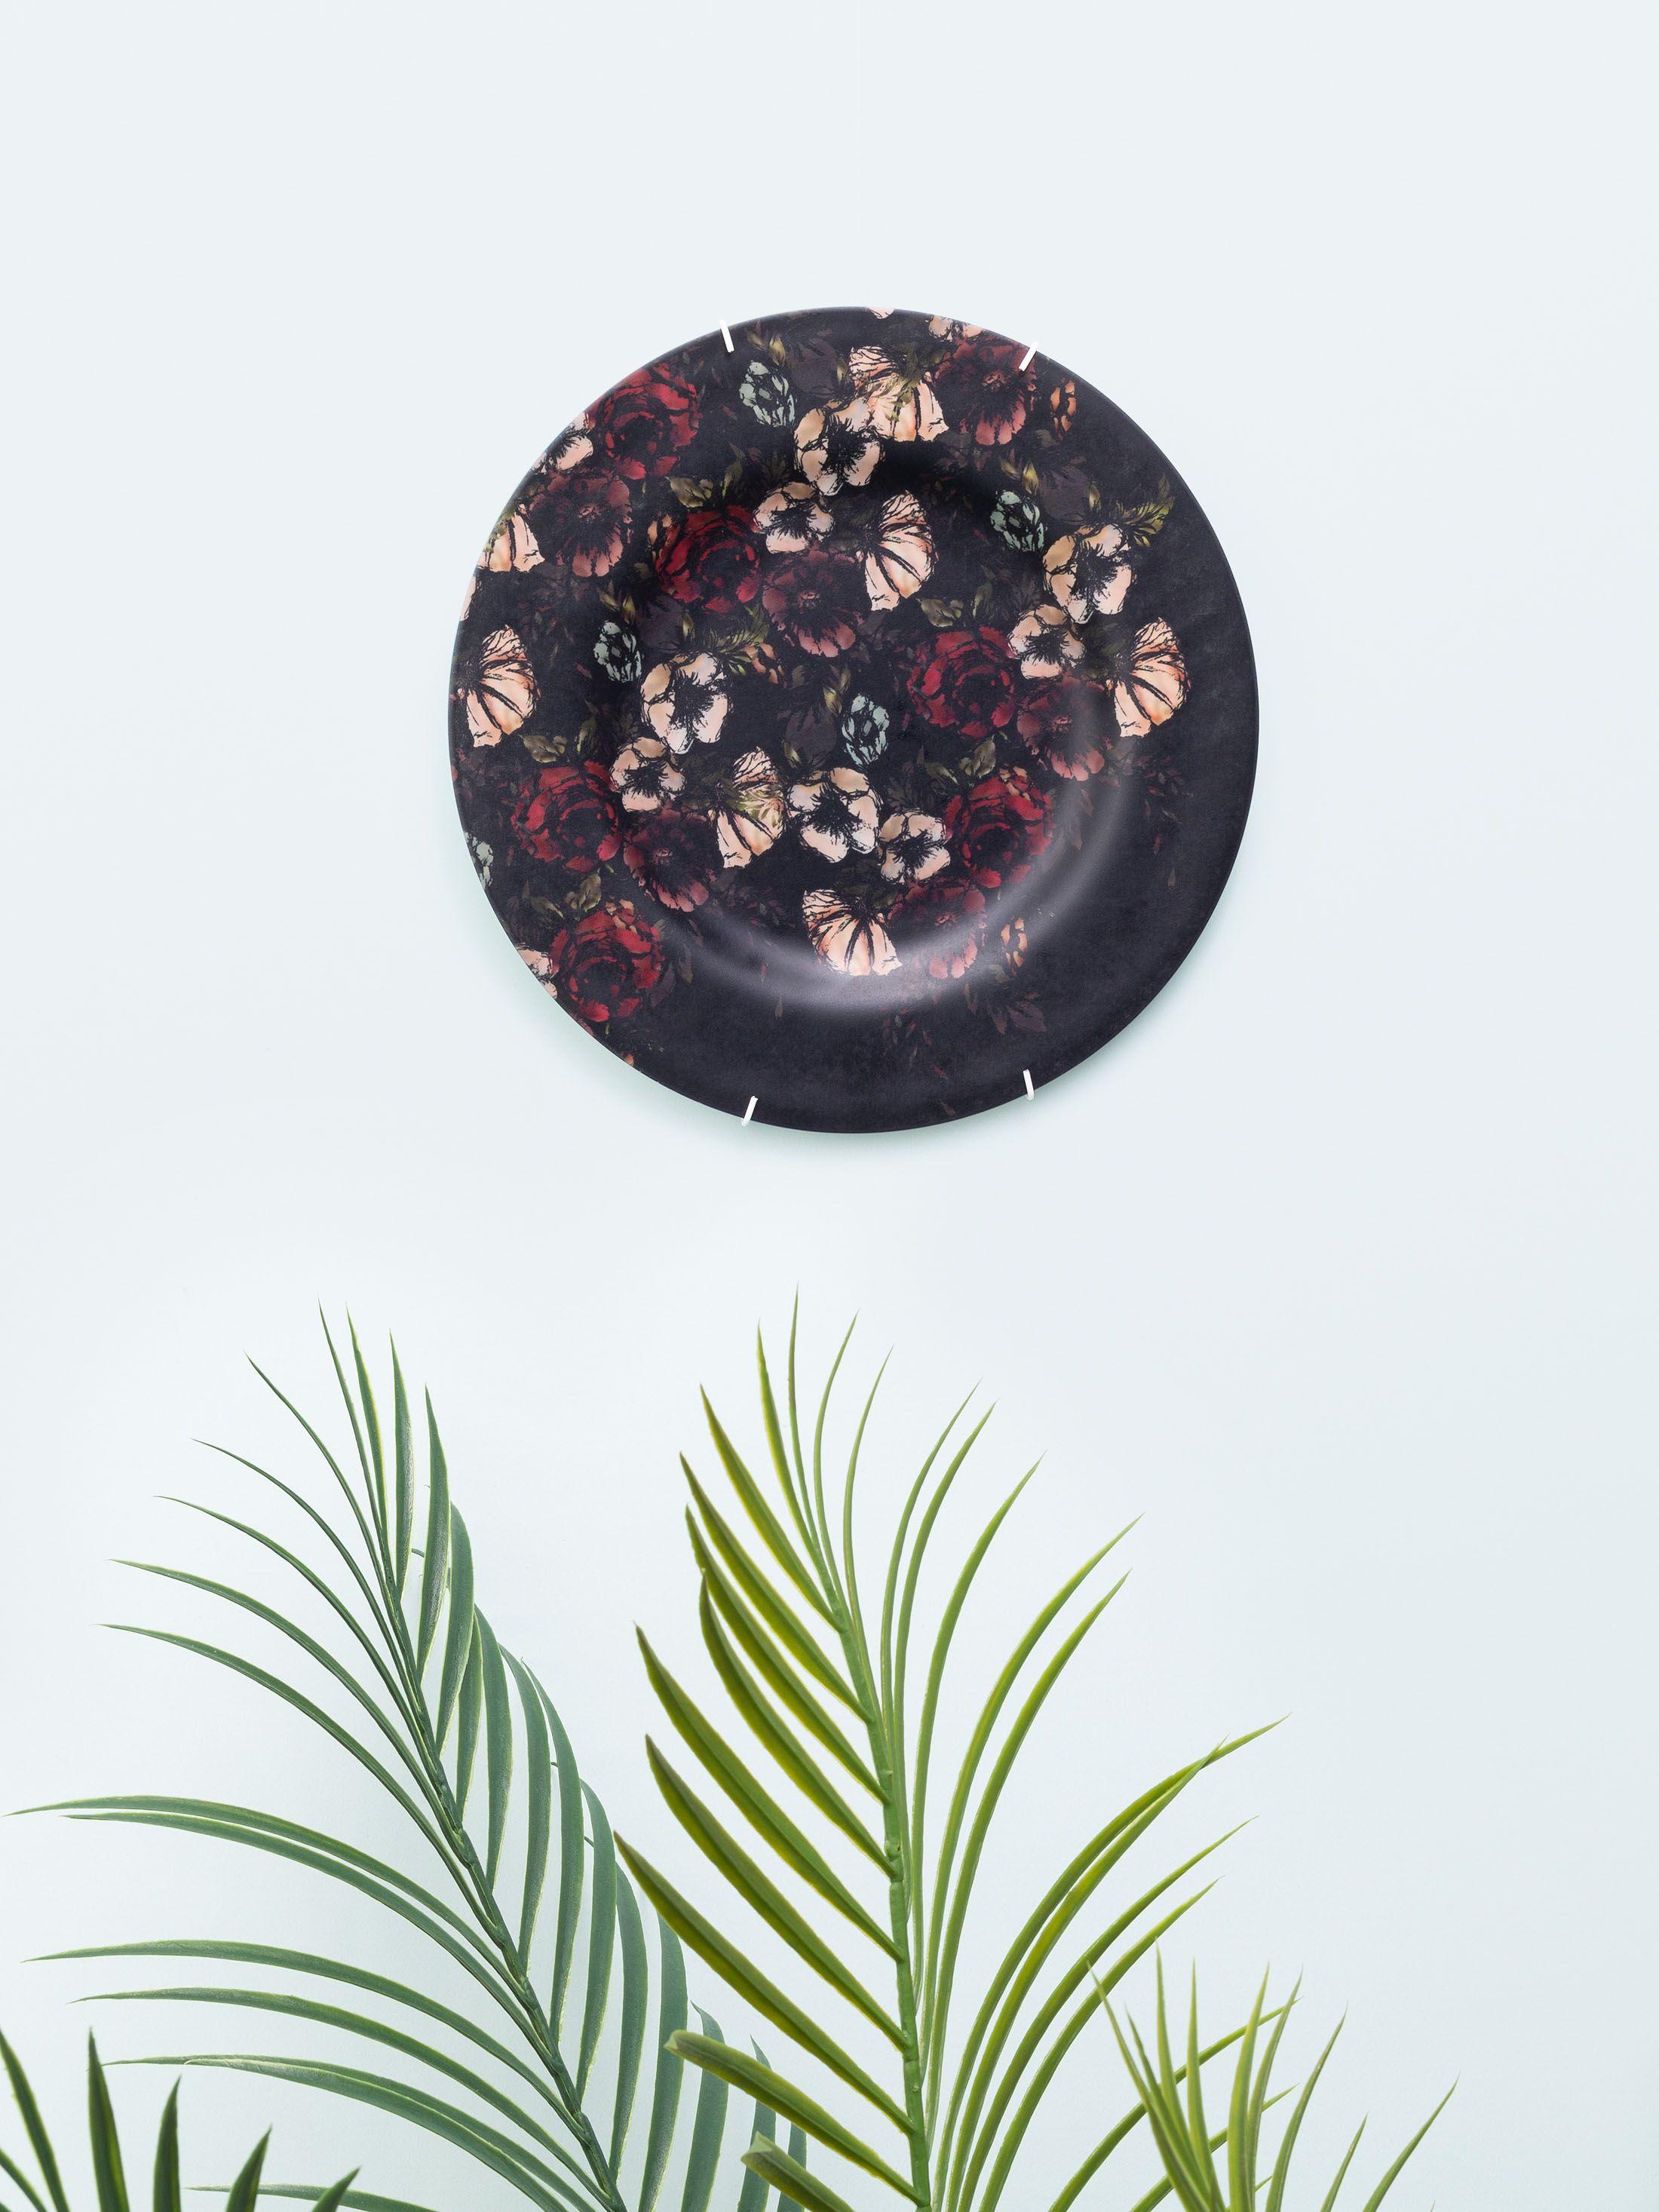 wall plates custom printed with Marilyn Munroe design